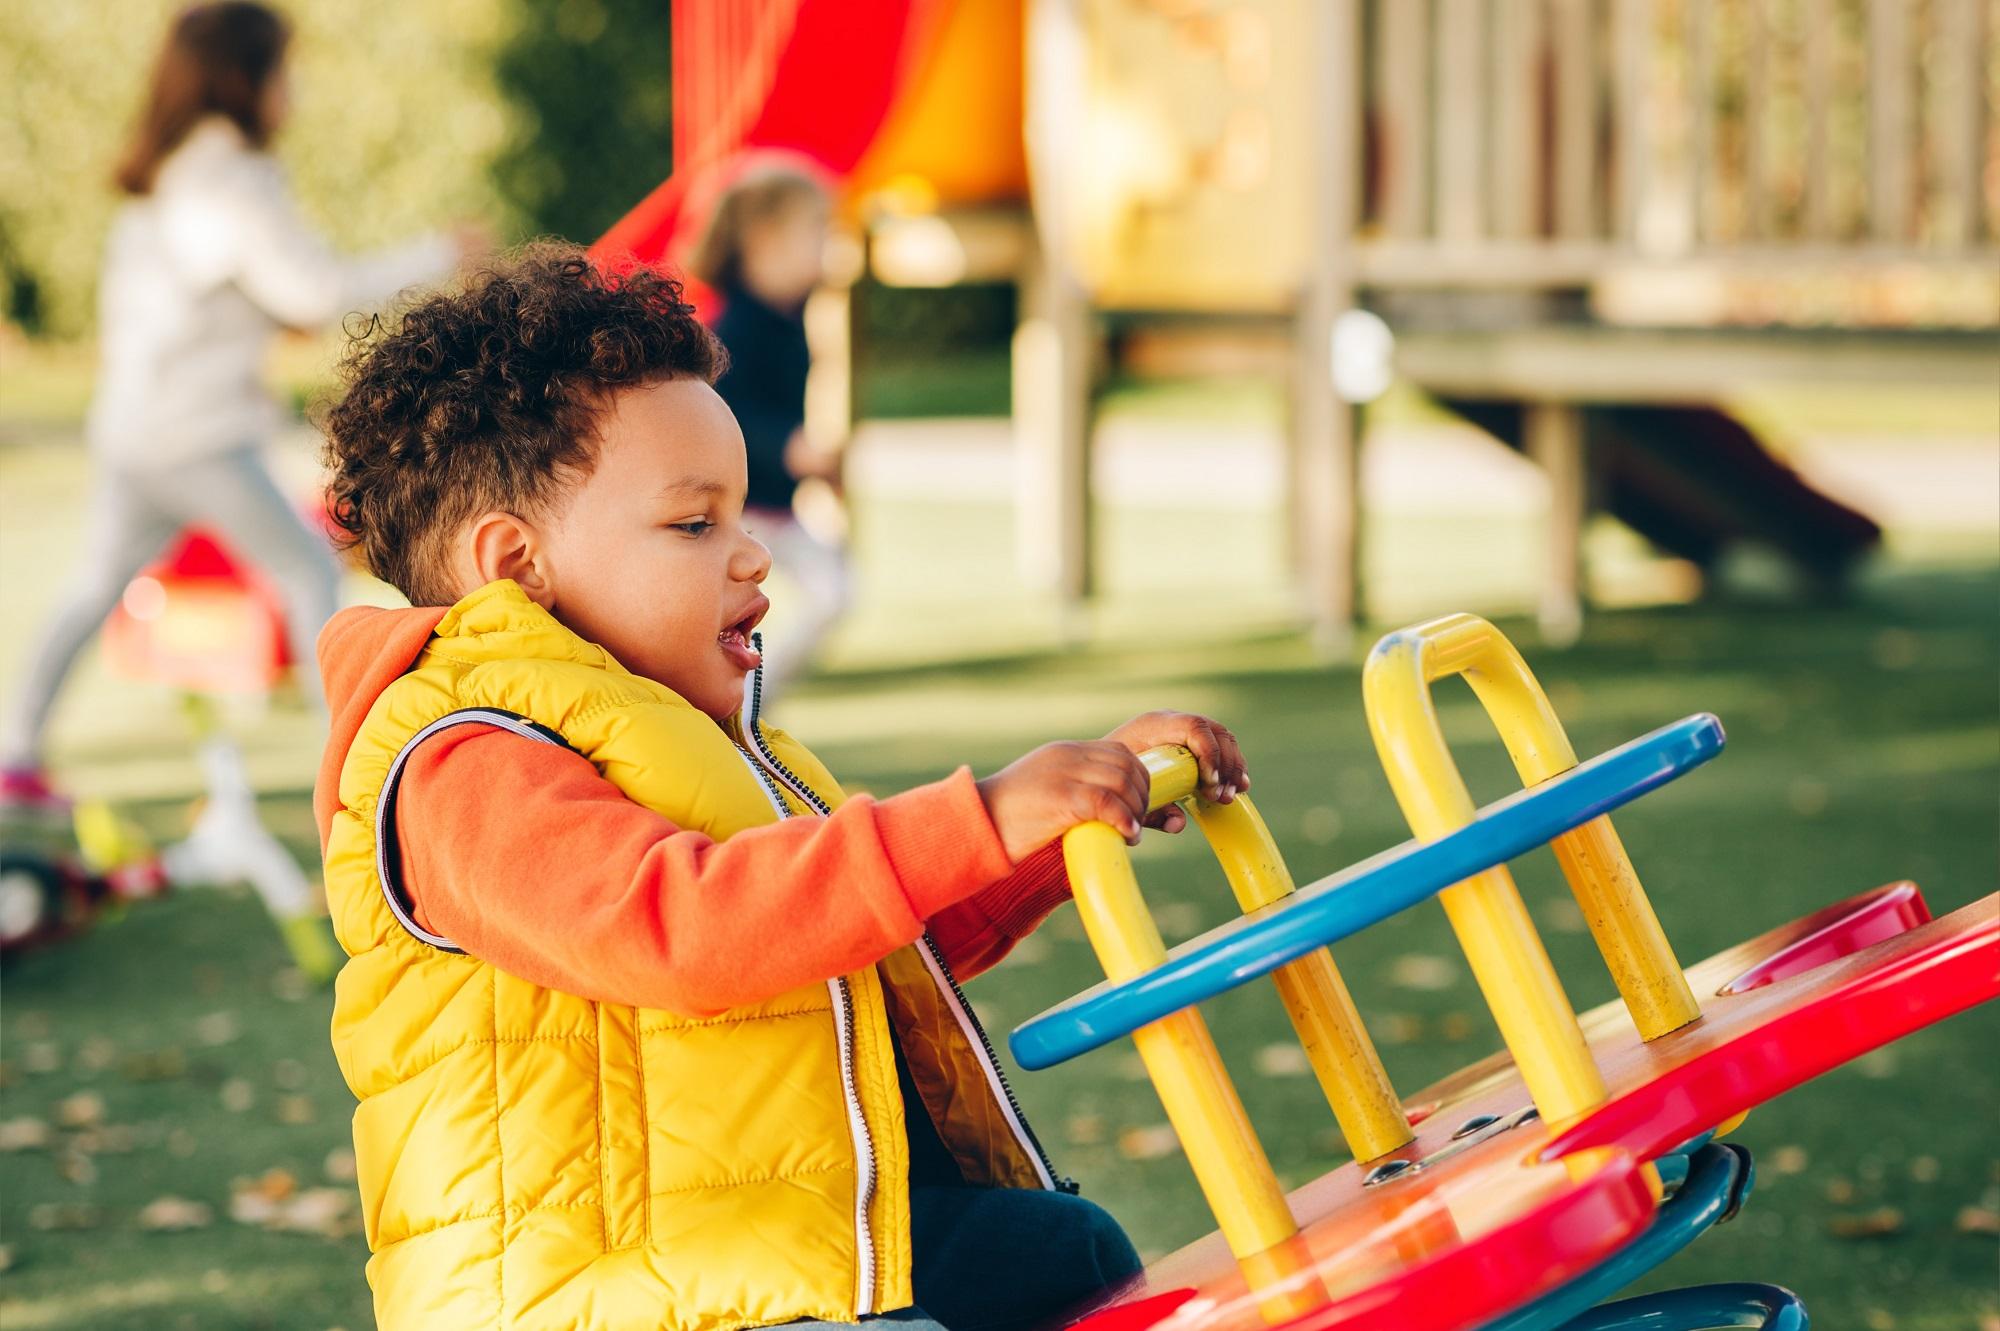 Agricultural pesticide drift contaminates children's playgrounds